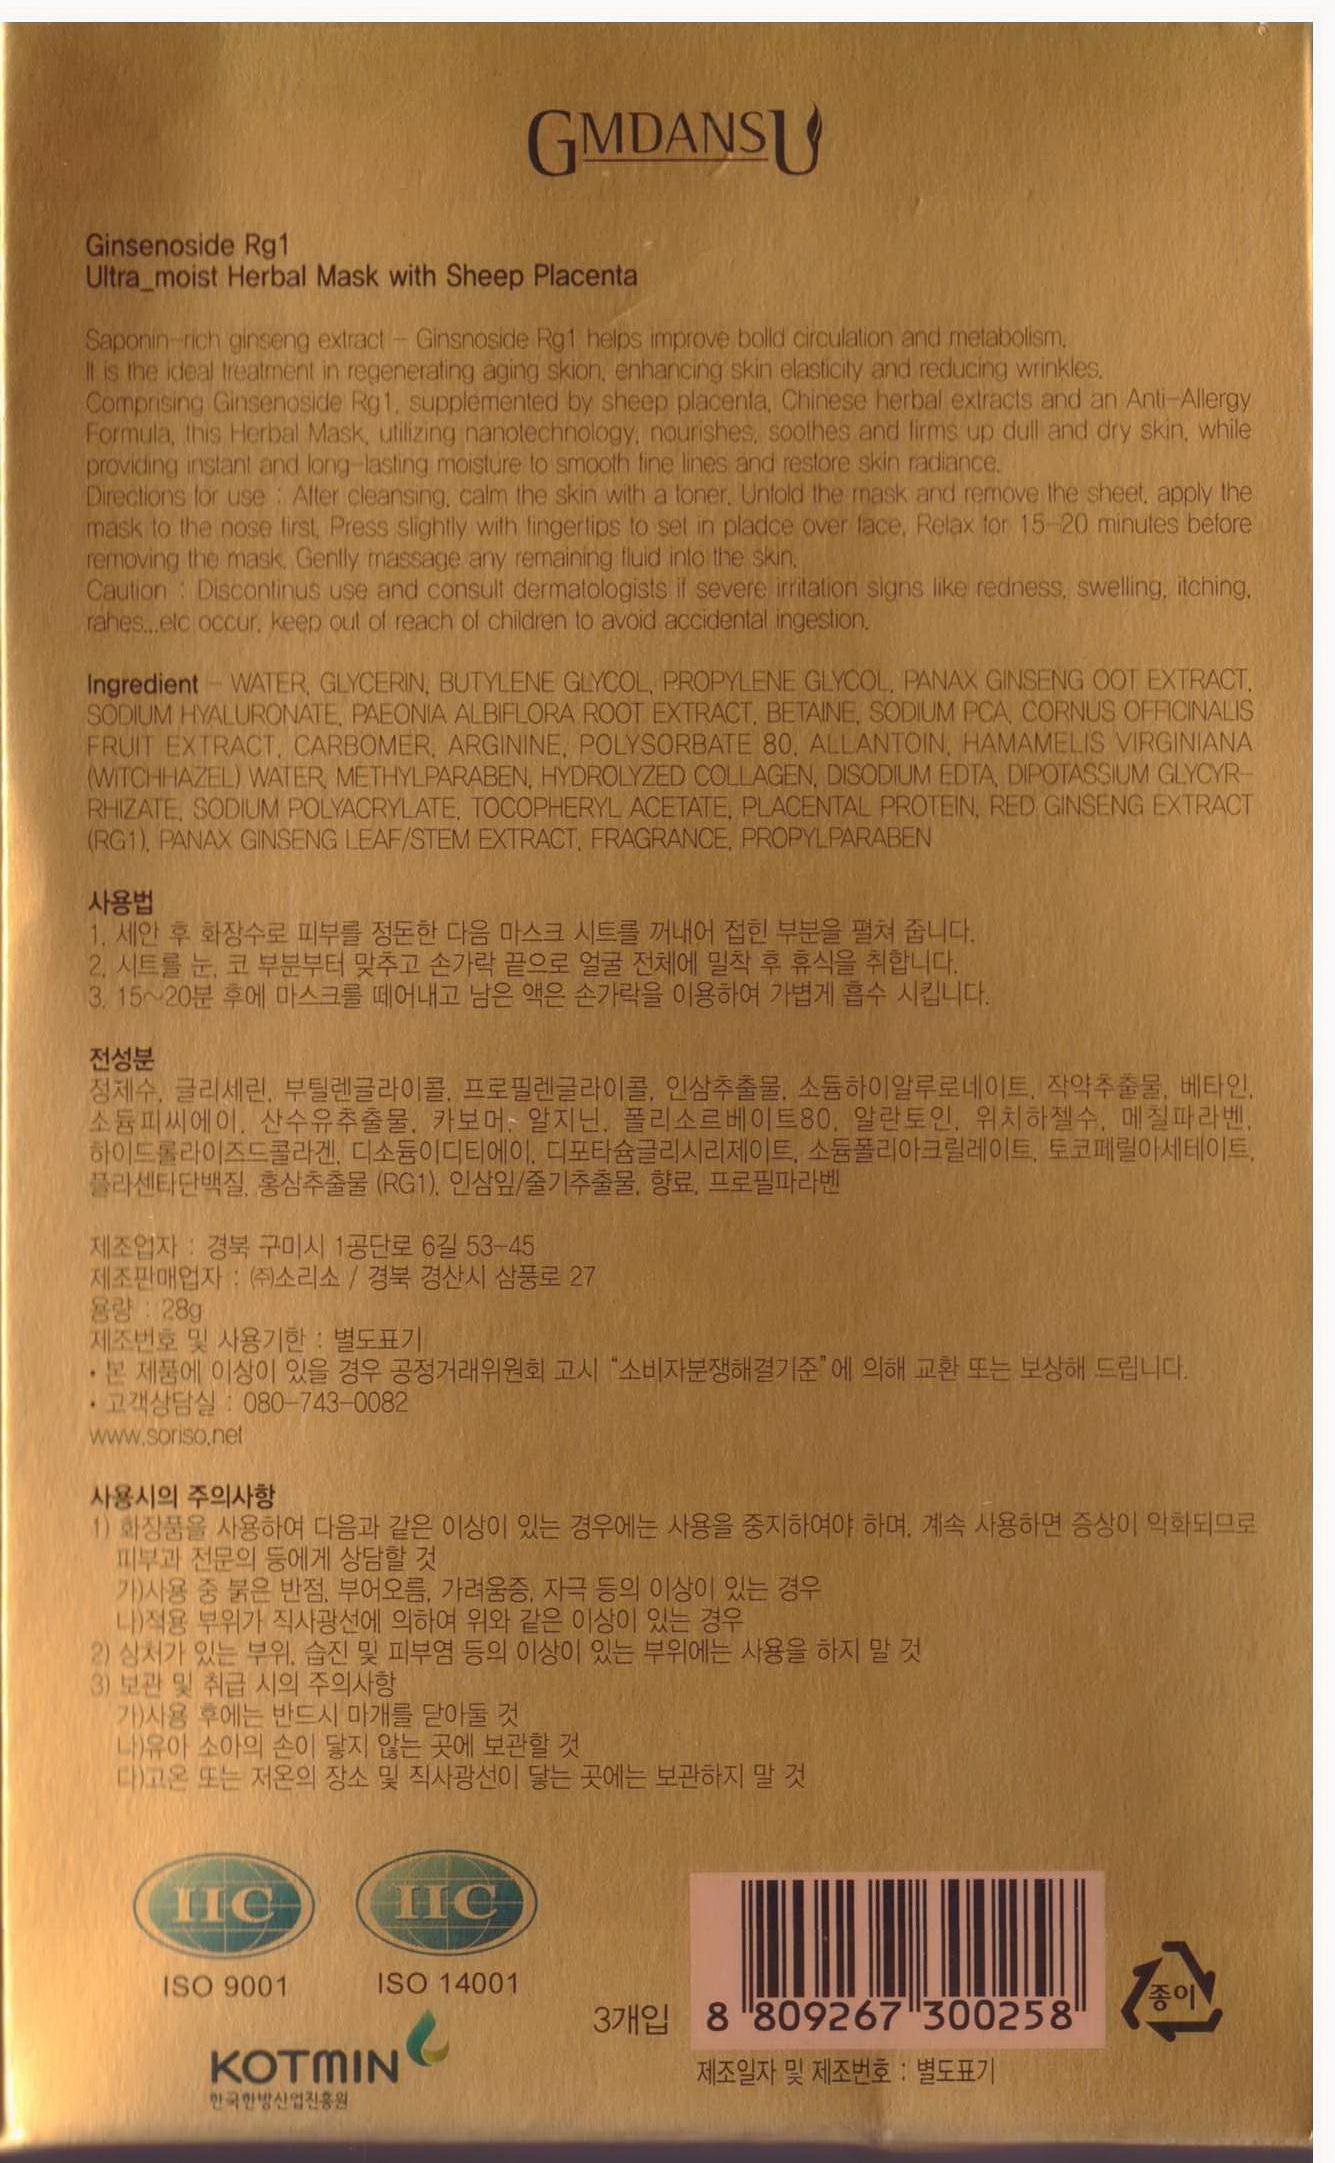 Gmdansu Eye Serum (Allantoin ) Liquid [Corporation Soriso]